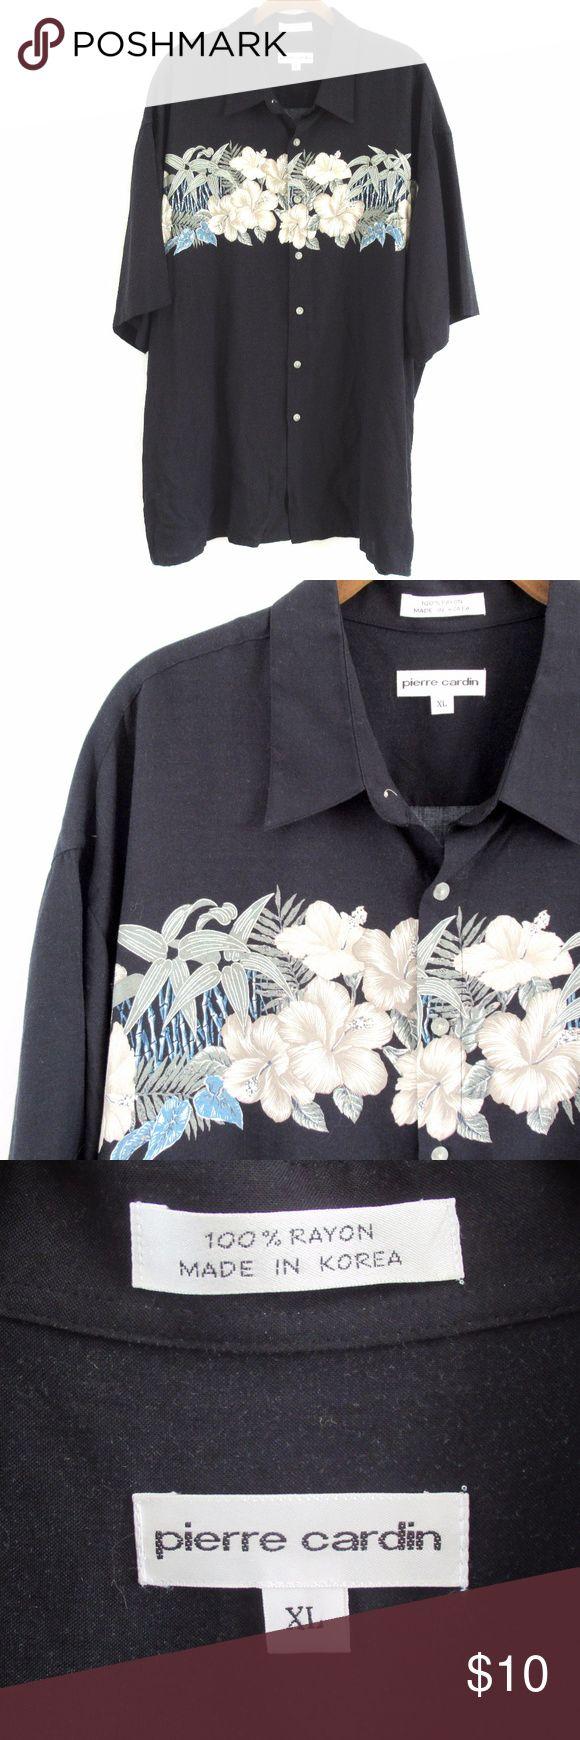 Pierre Cardin Men's Hawaiian Shirt 100% Rayon Dark navy with floral pattern Short Sleeves; Button front Size XL Pierre Cardin Shirts